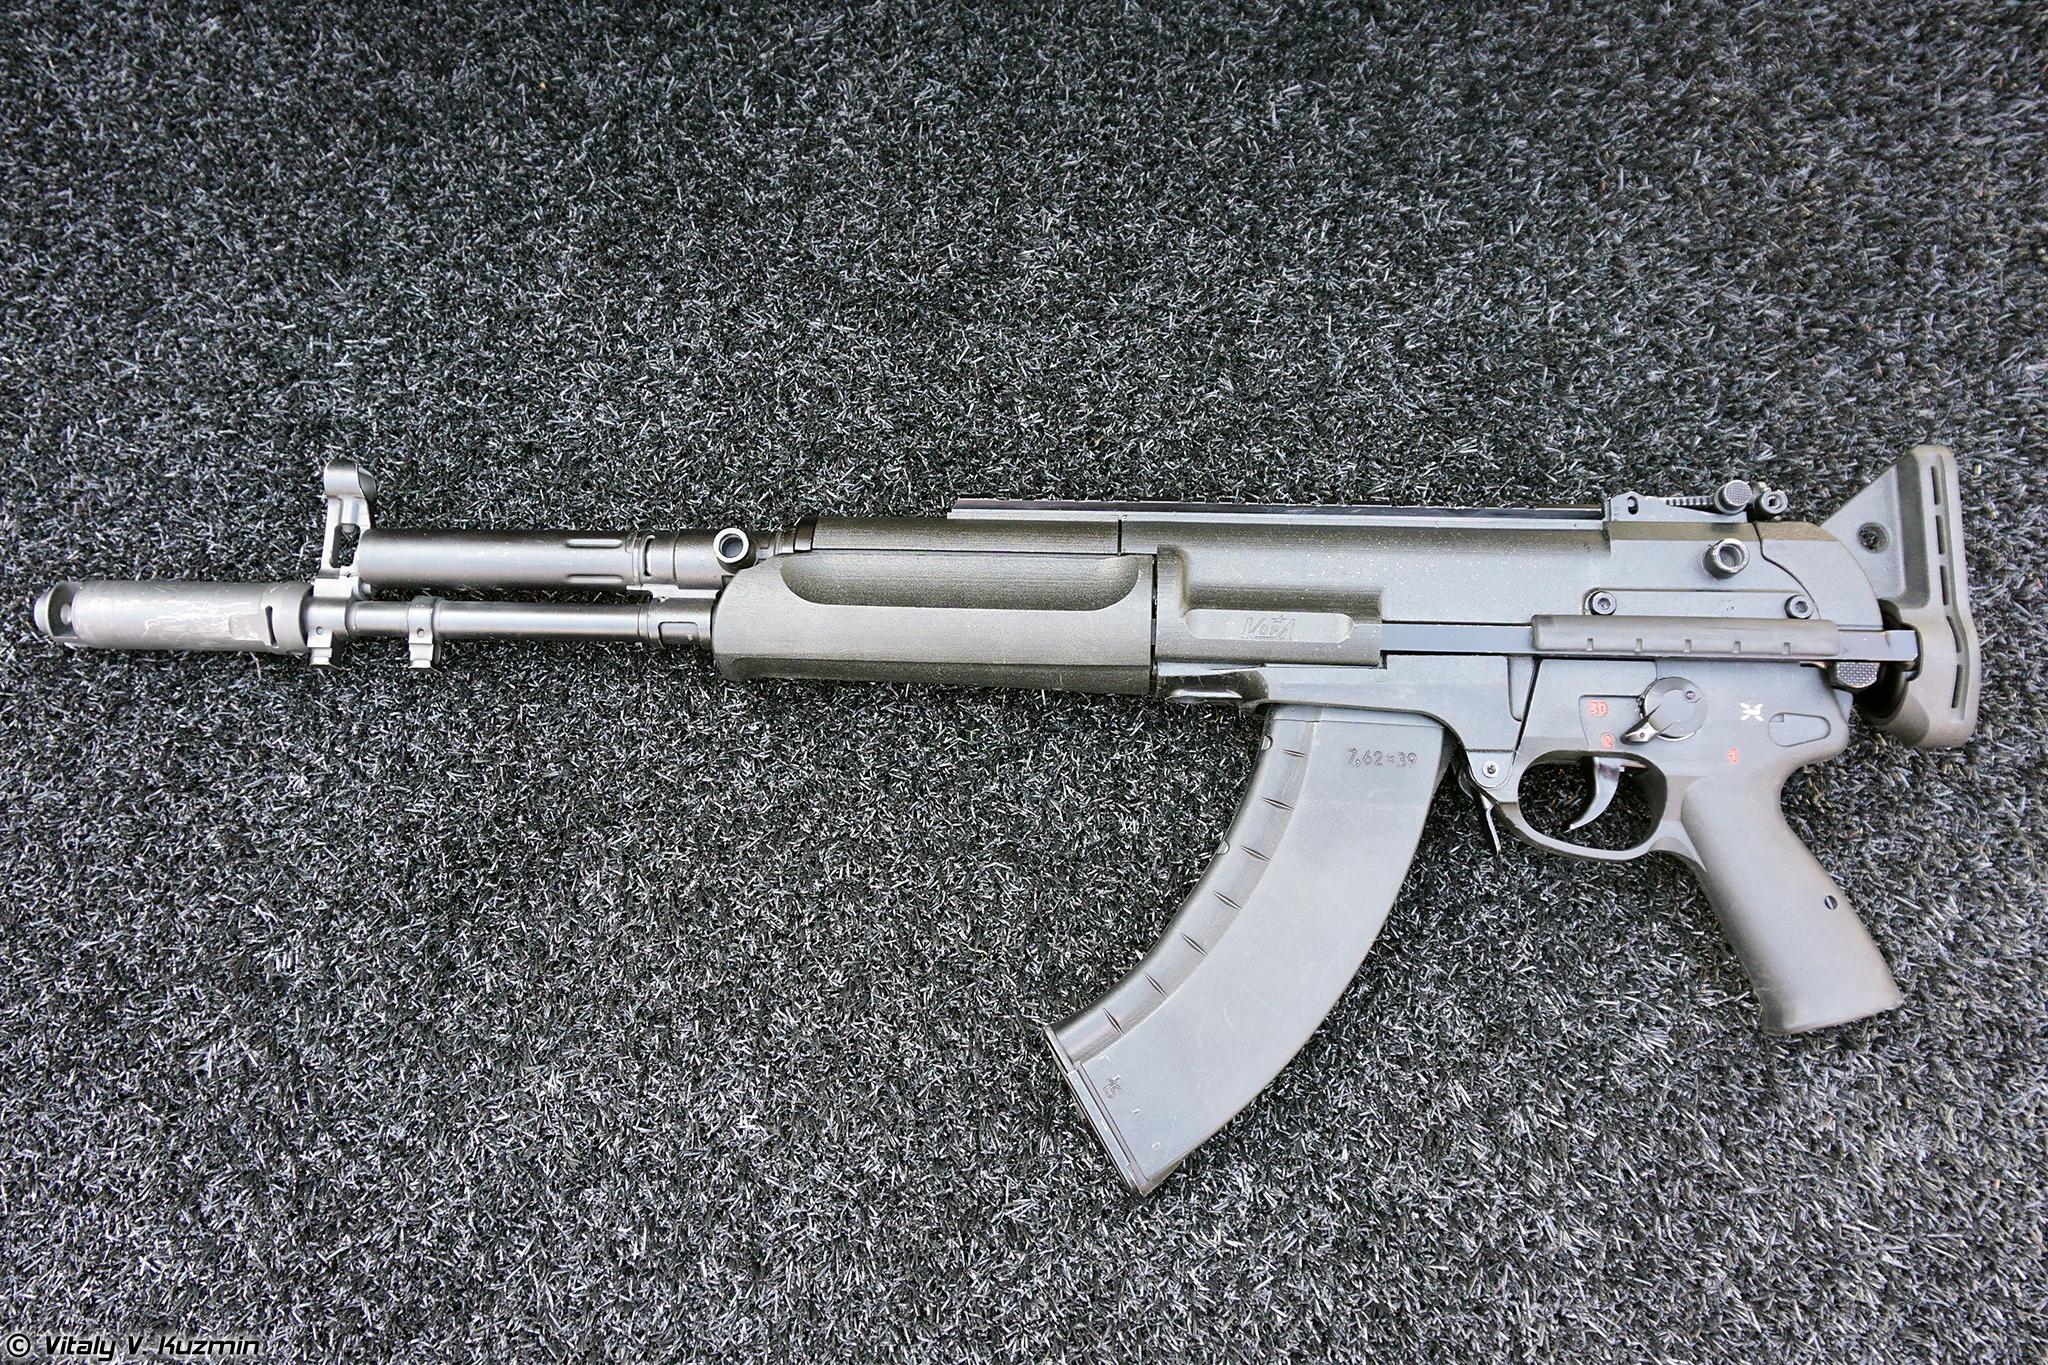 Russian Assault Rifles/Carbines/Machine Guns Thread: #2 - Page 10 Army-2020-Pavilions-018-X4